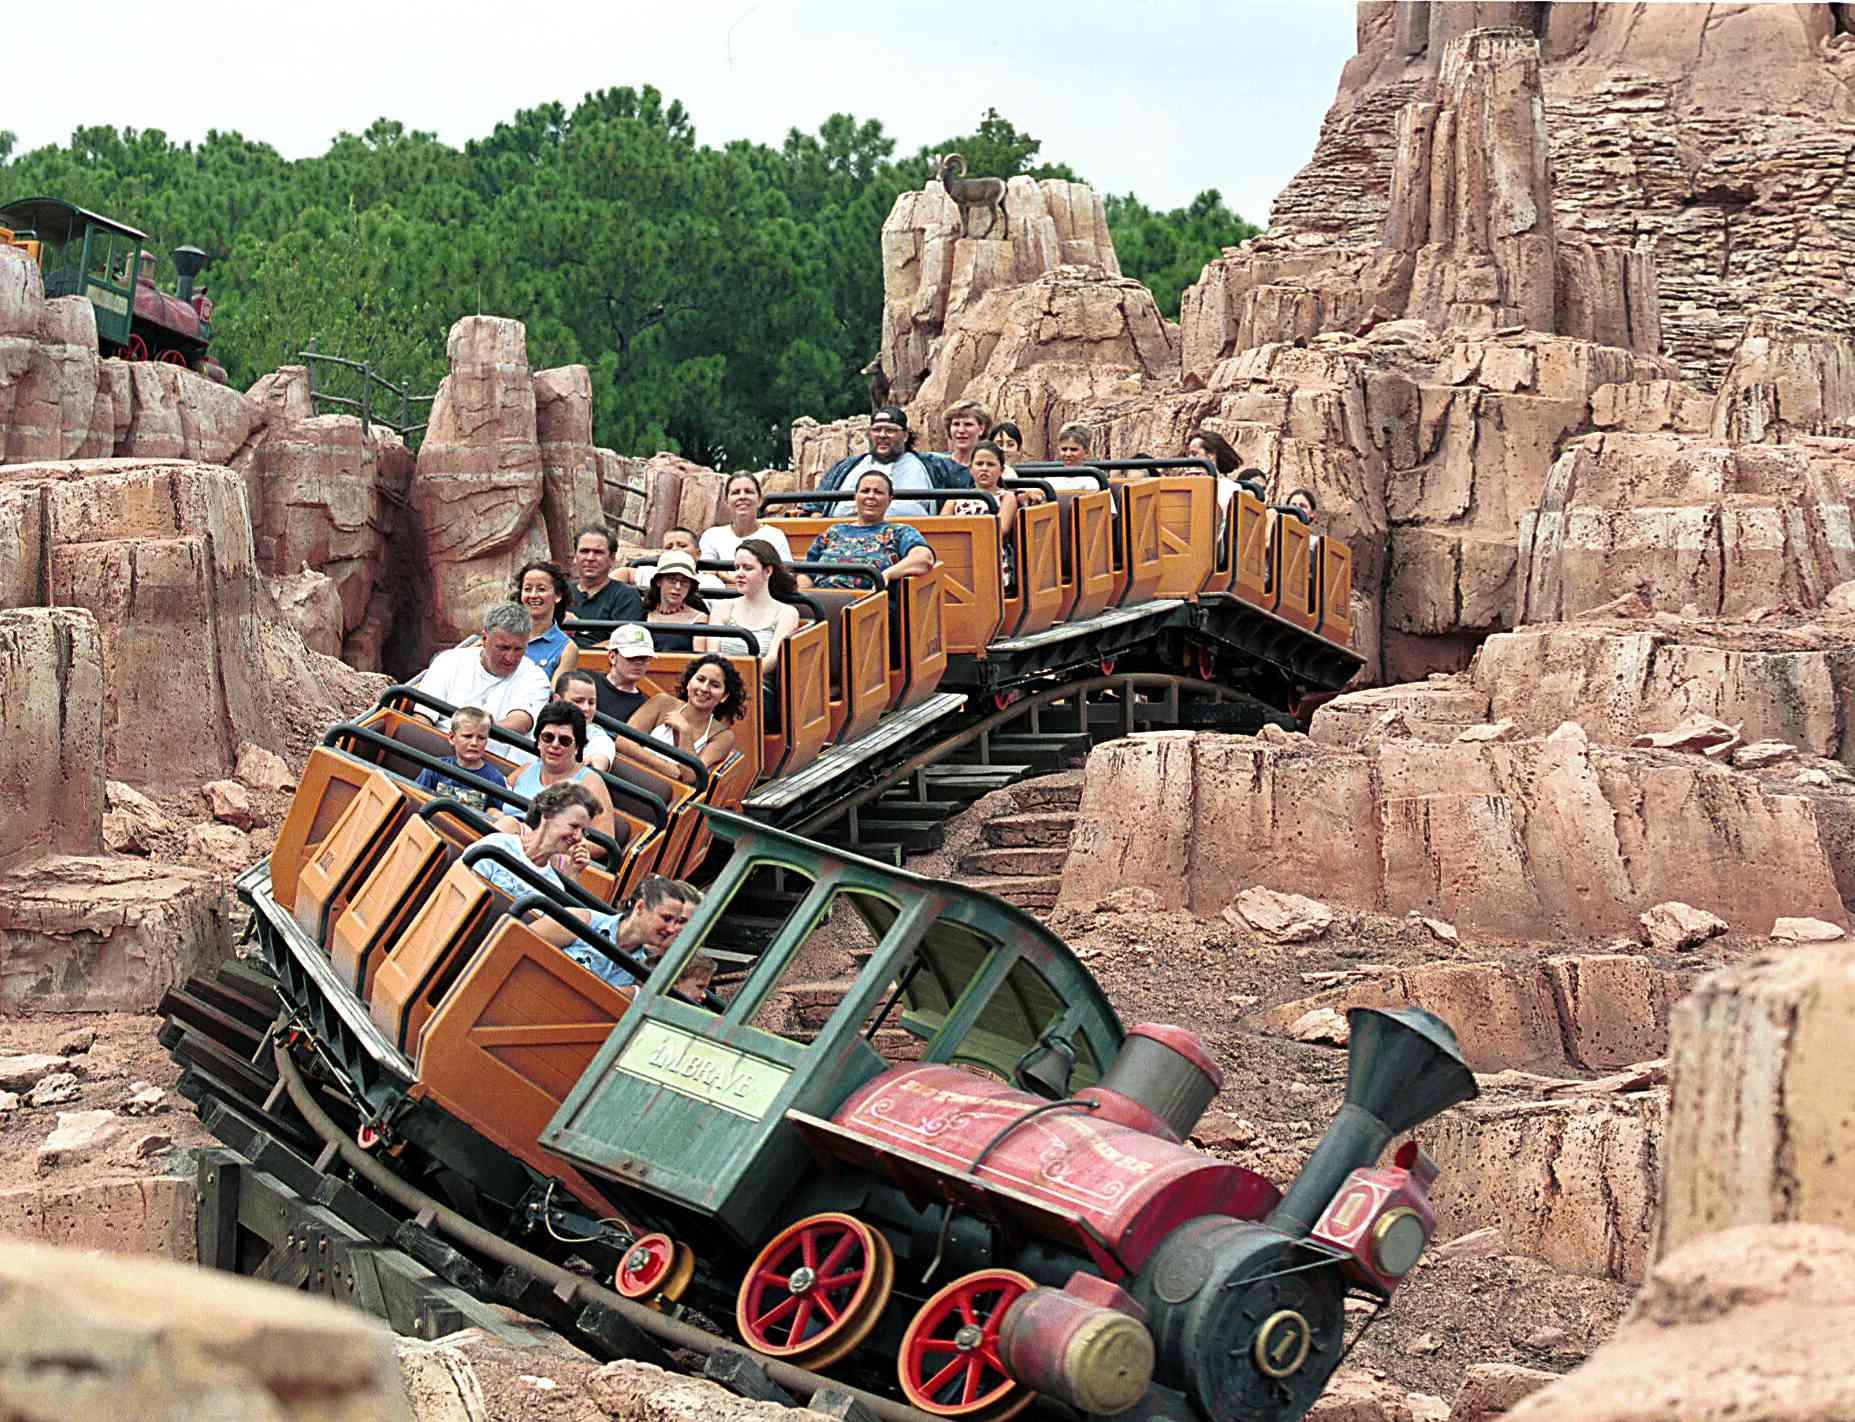 Big Thunder Mountain Railroad coaster